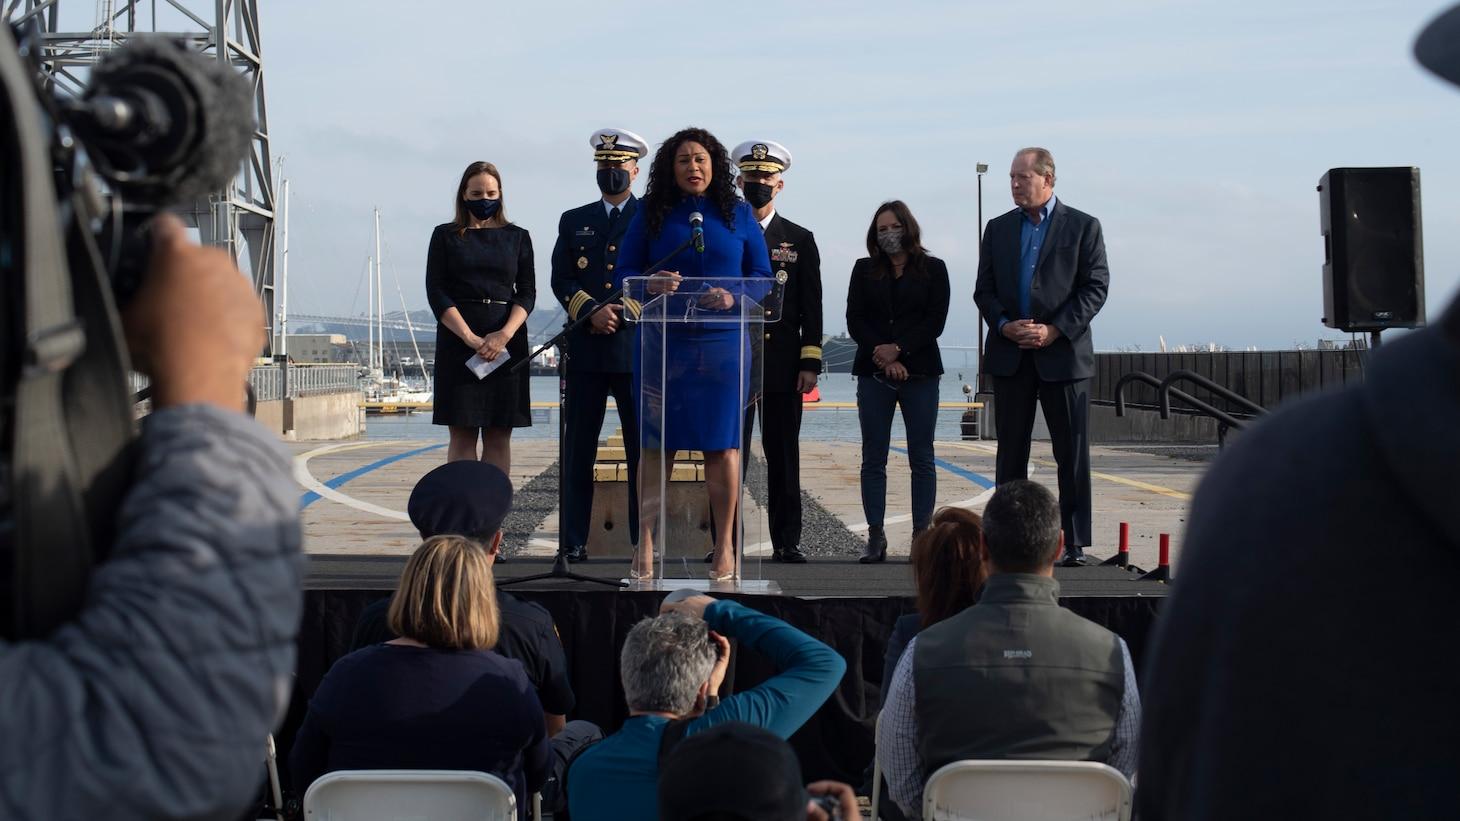 The 40th Annual San Francisco Fleet Week Begins